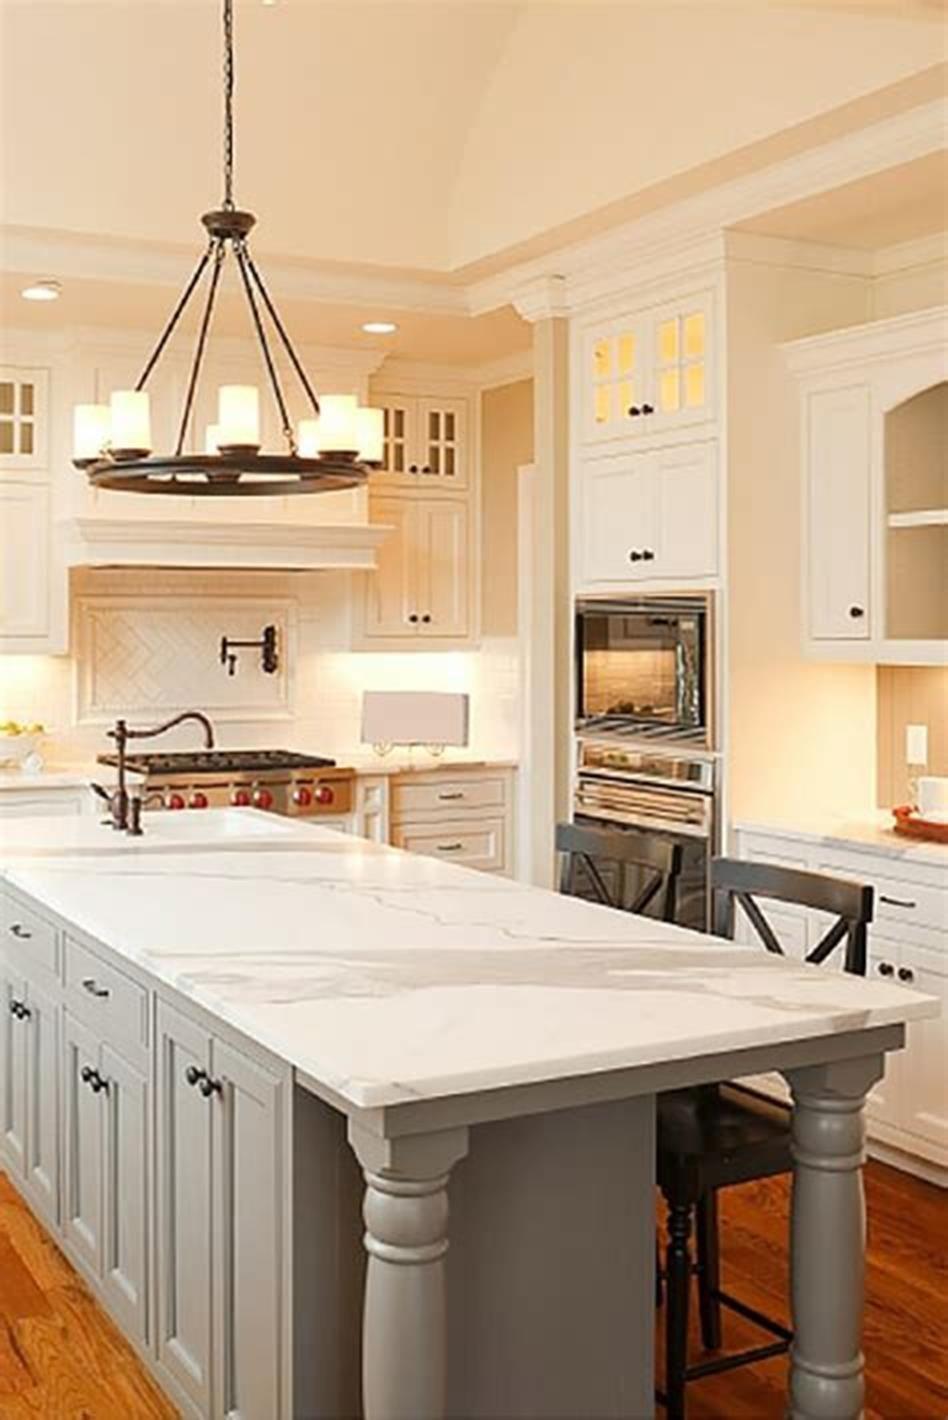 46 most popular kitchen design ideas 2019 youll love 3 kitchen backsplash trends kitchen on i kitchen remodel id=49525